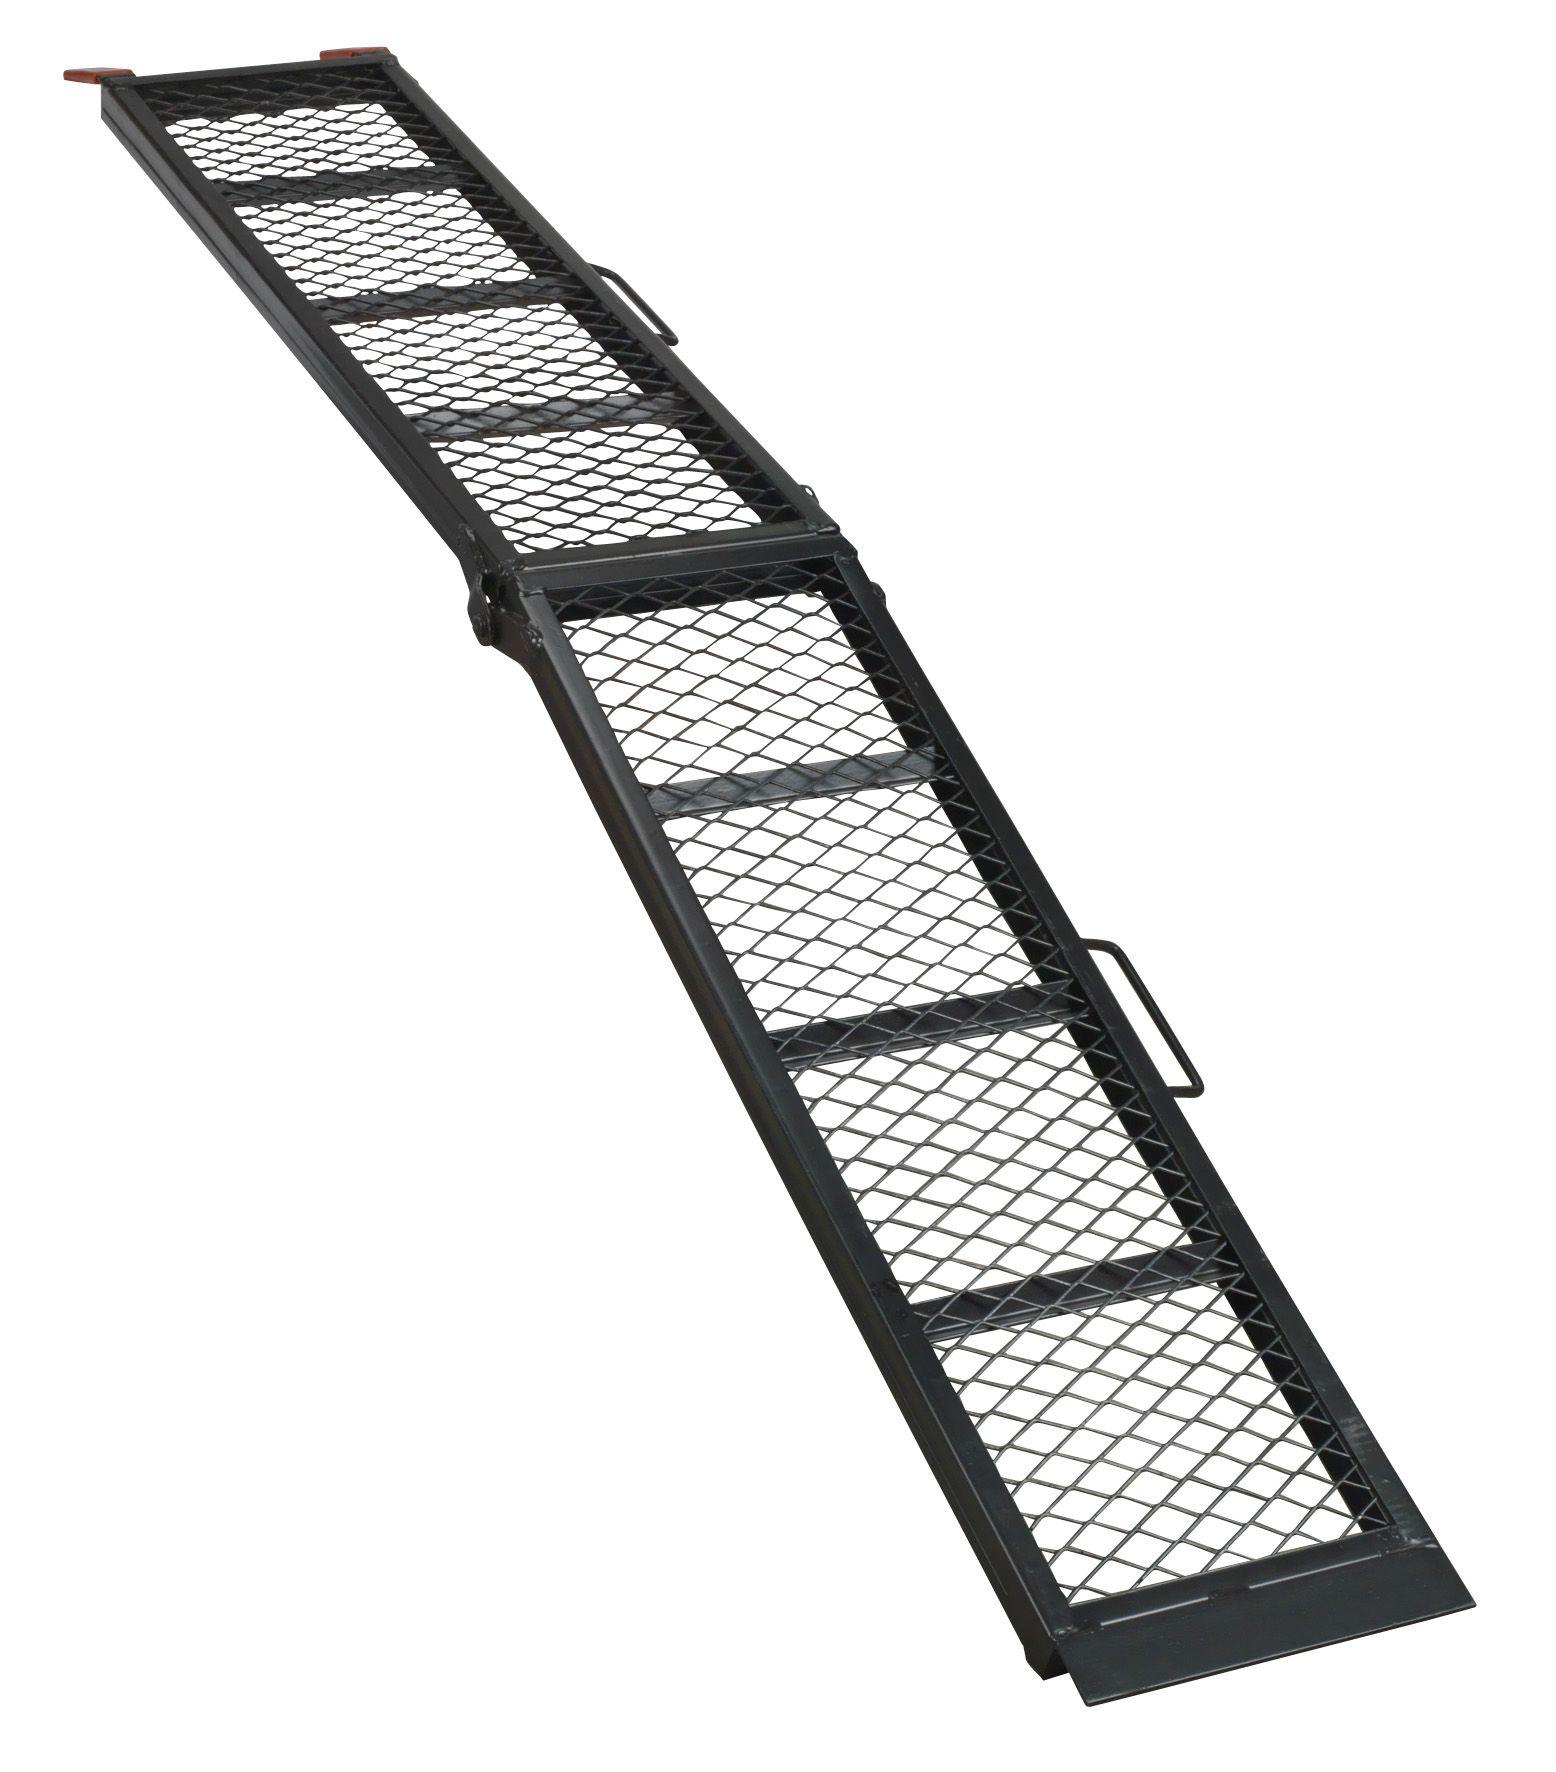 Sealey Steel Mesh Folding Loading Ramp 360kg Capacity